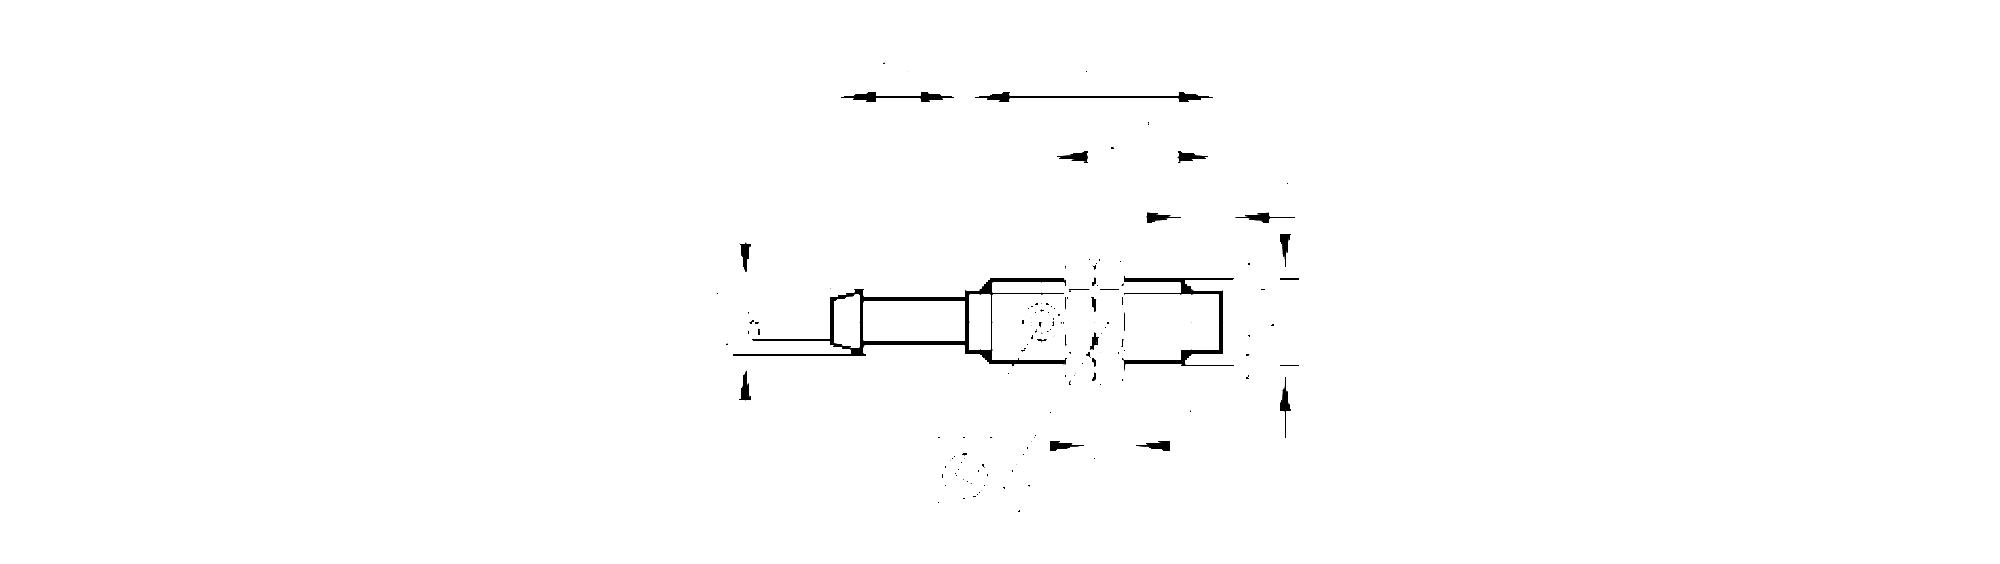 If5249 - Inductive Sensor